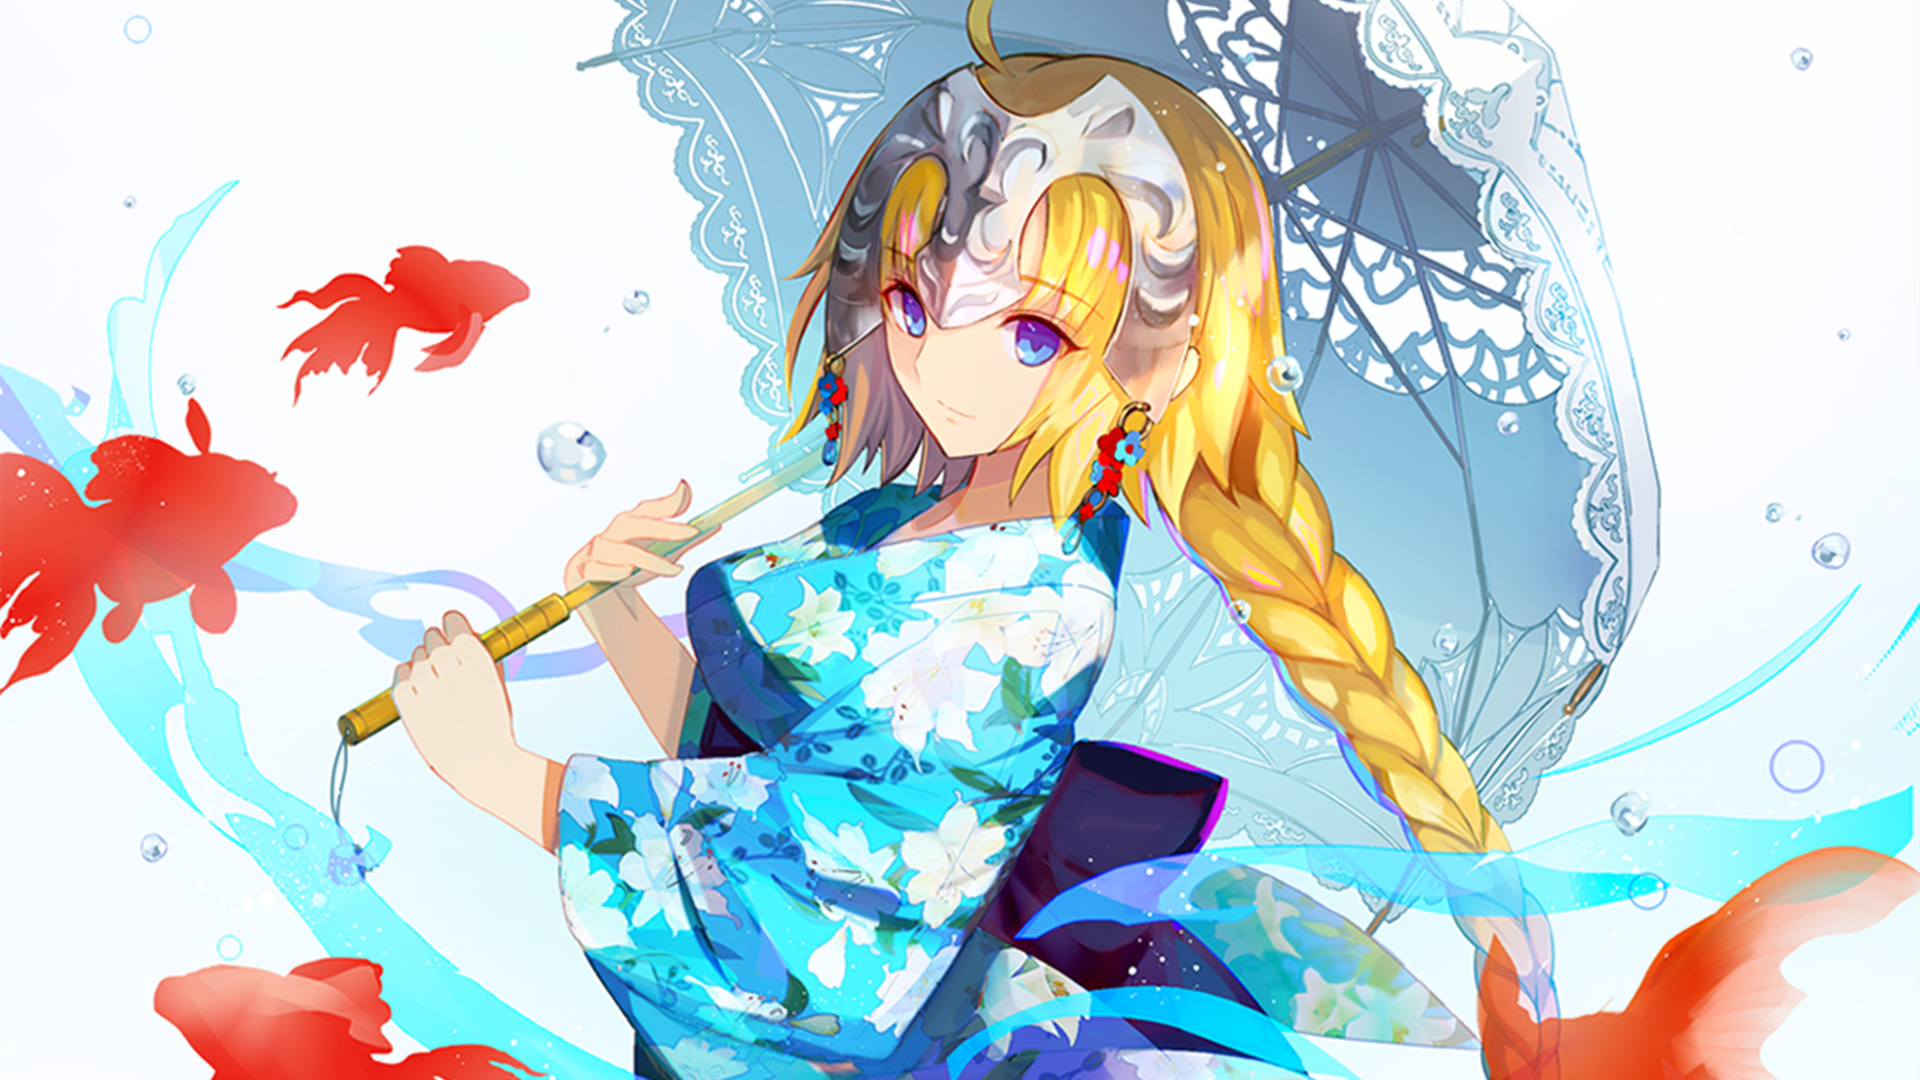 Fate Grand Order壁纸 Fate系列 人气手游fate Grand Order 桌面天下手机版